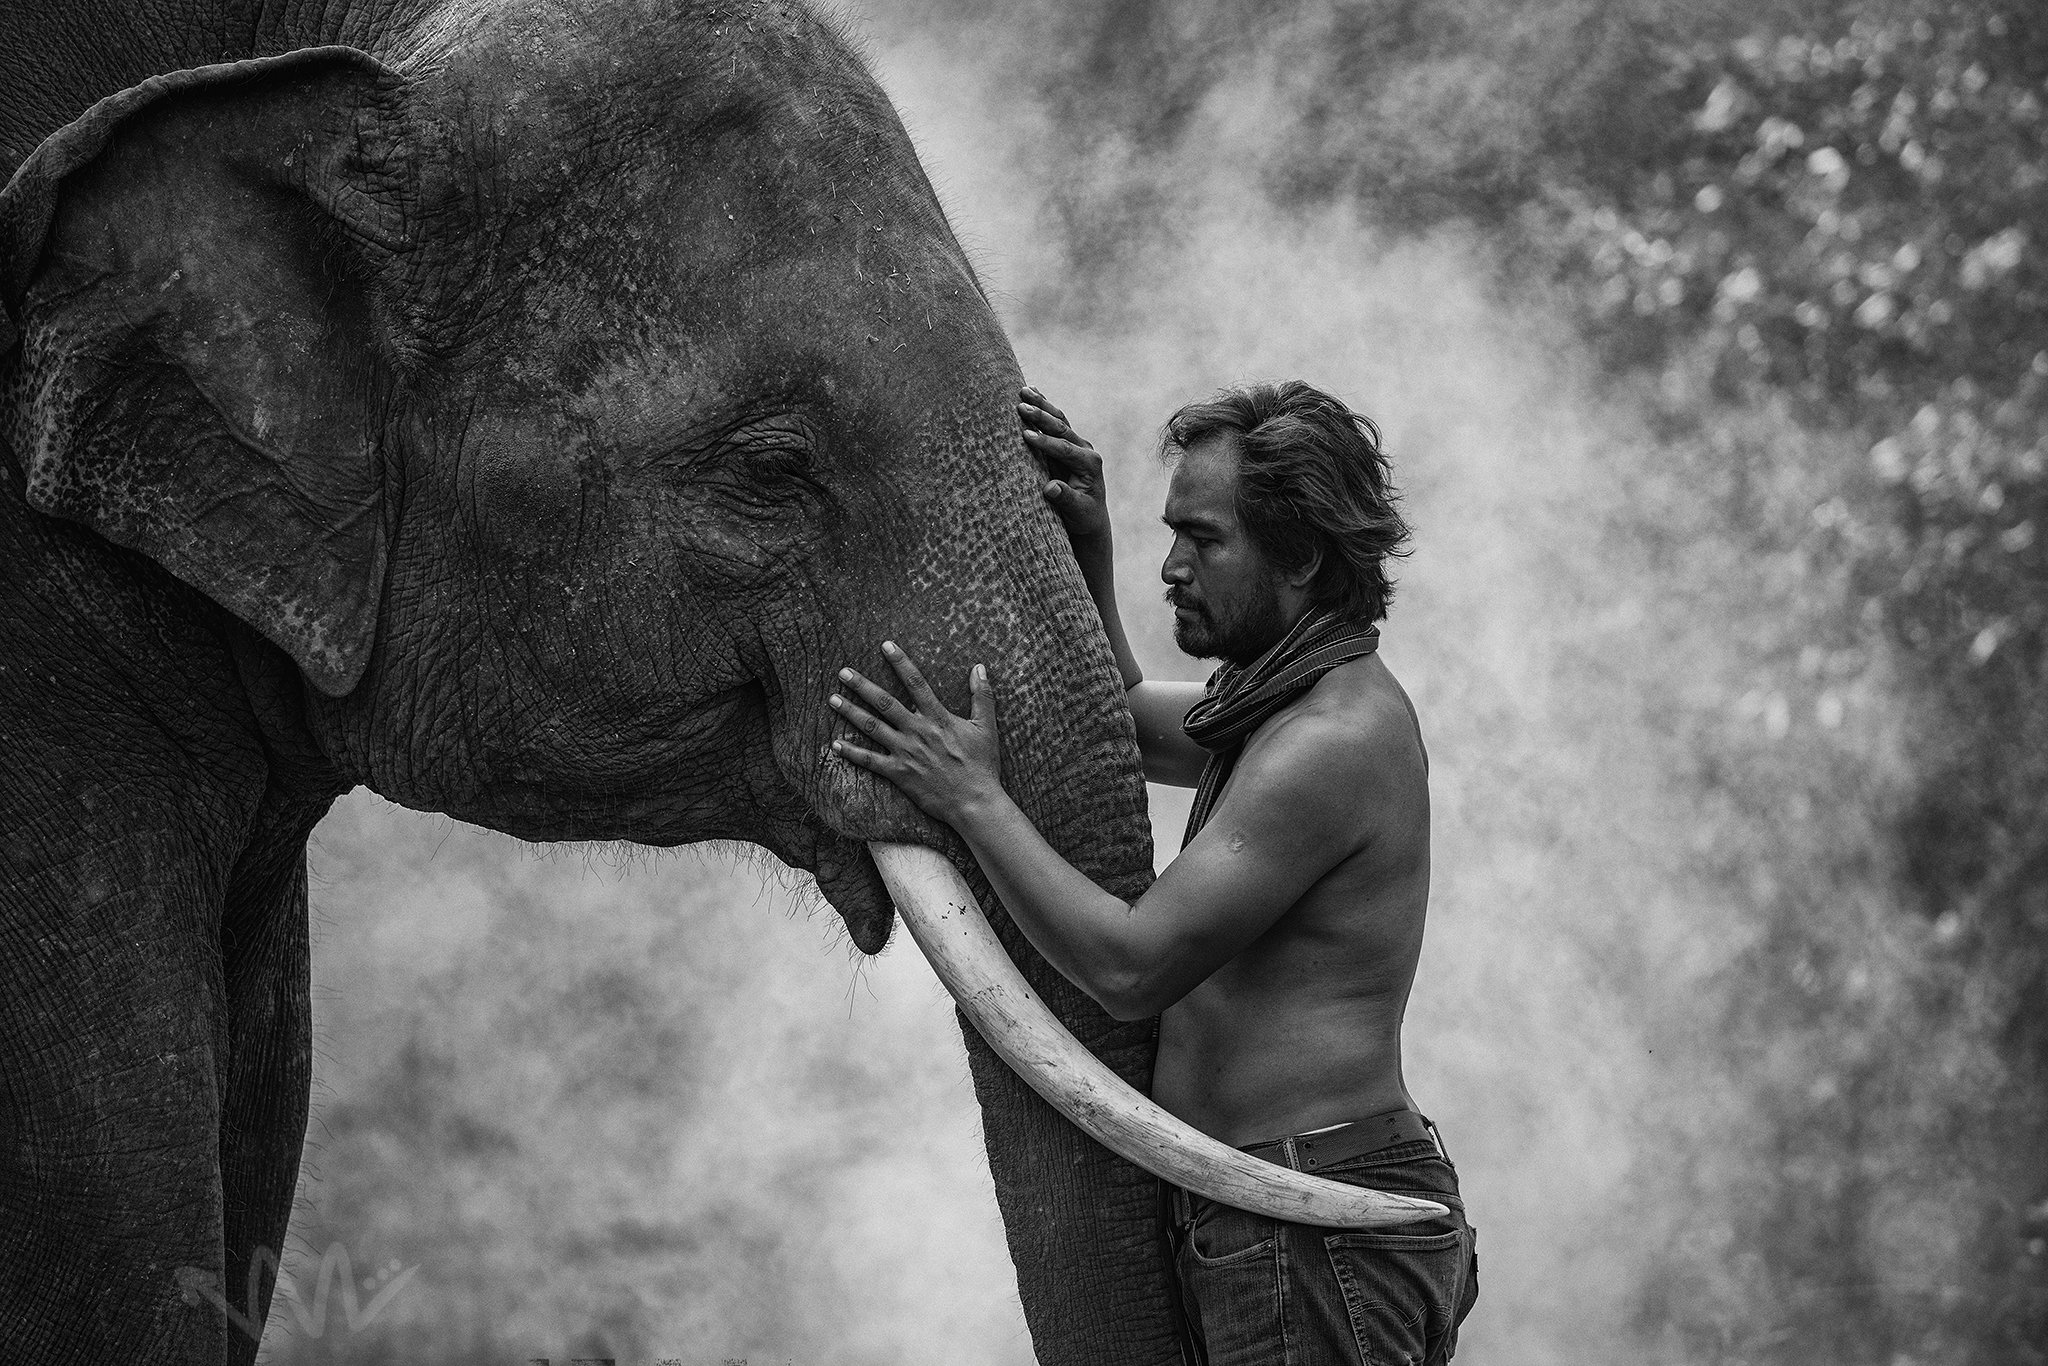 elephant,Thai,Thailand,BW,Animal,Portrait,man,mahout,, SUTIPOND SOMNAM